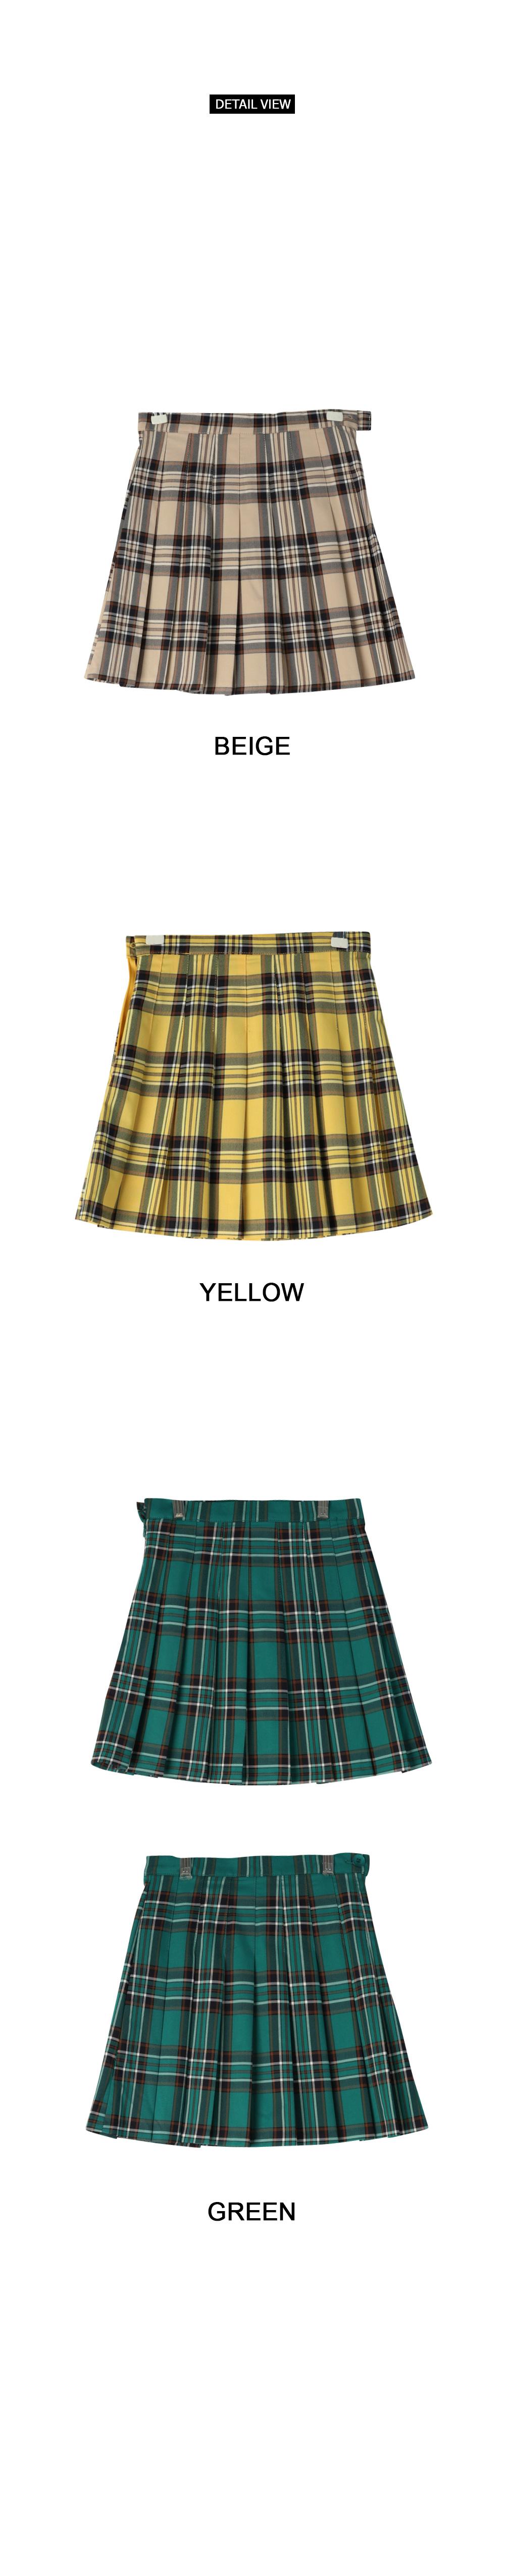 Lily Check Tennis Skirt